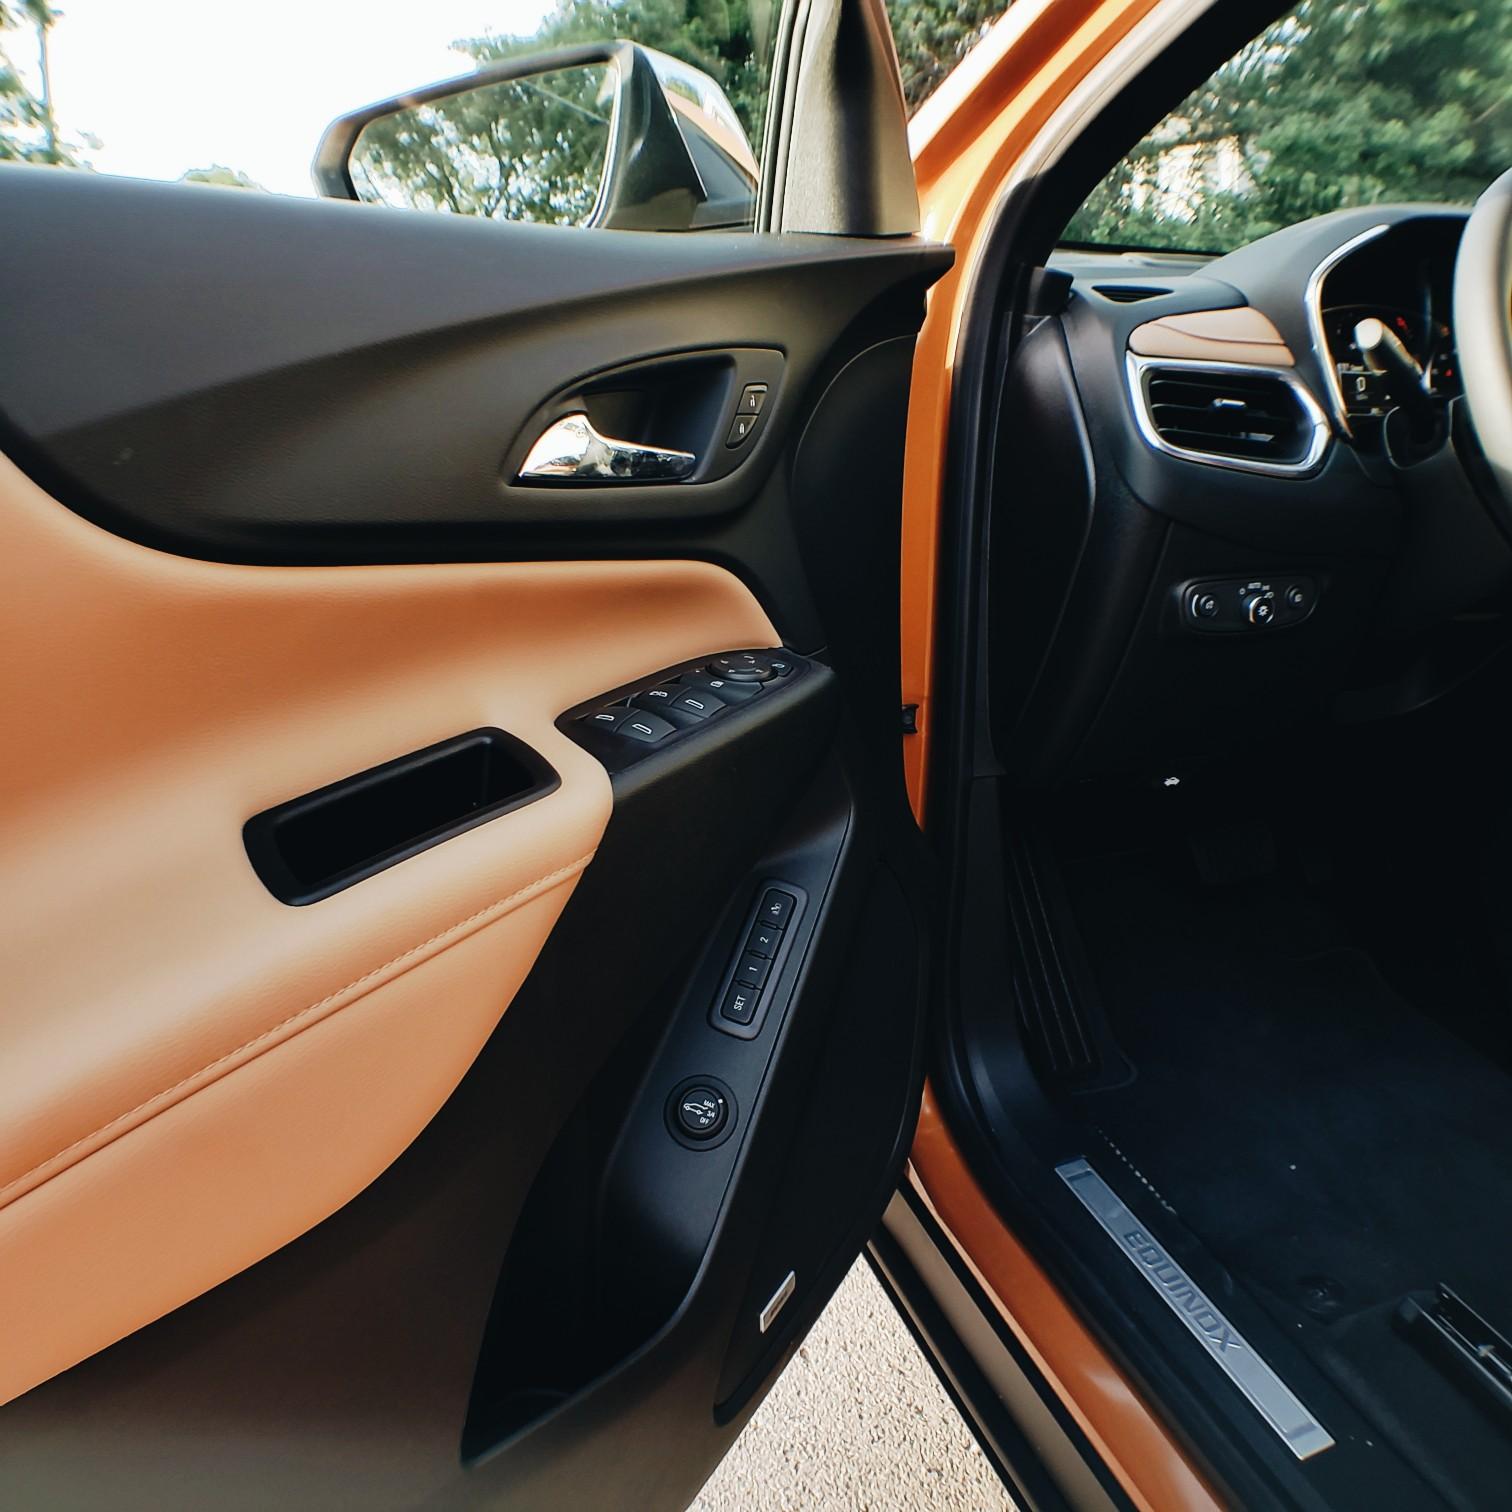 2018 Premiere Chevrolet Equinox Interior